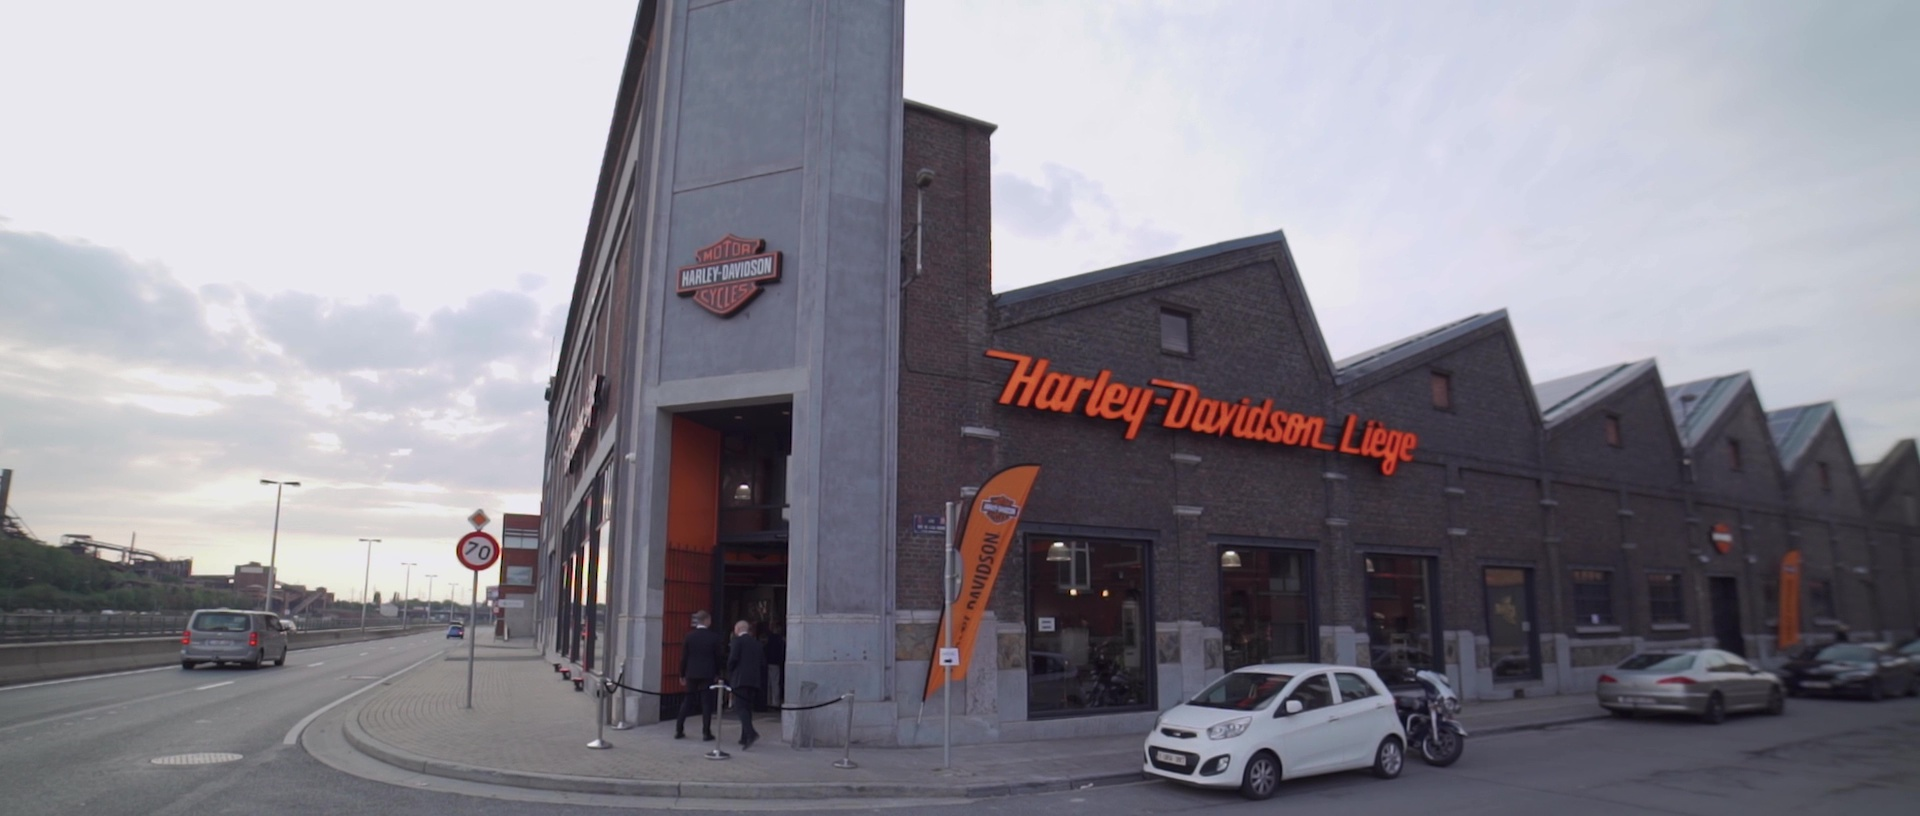 Inauguration Harley-Davidson Liège